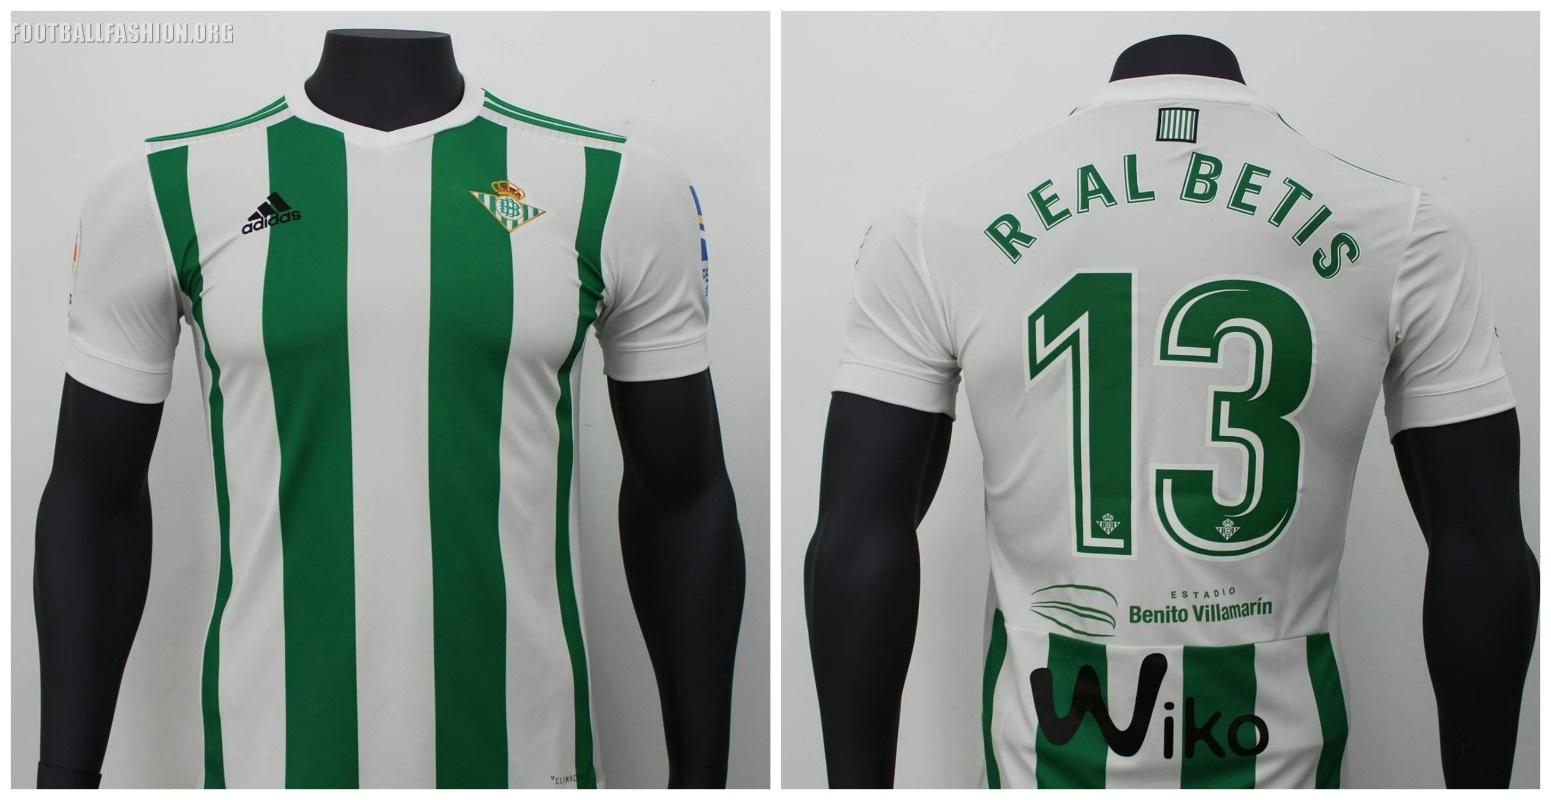 Real Betis 2017/18 adidas Home and Away Kits - FOOTBALL FASHION